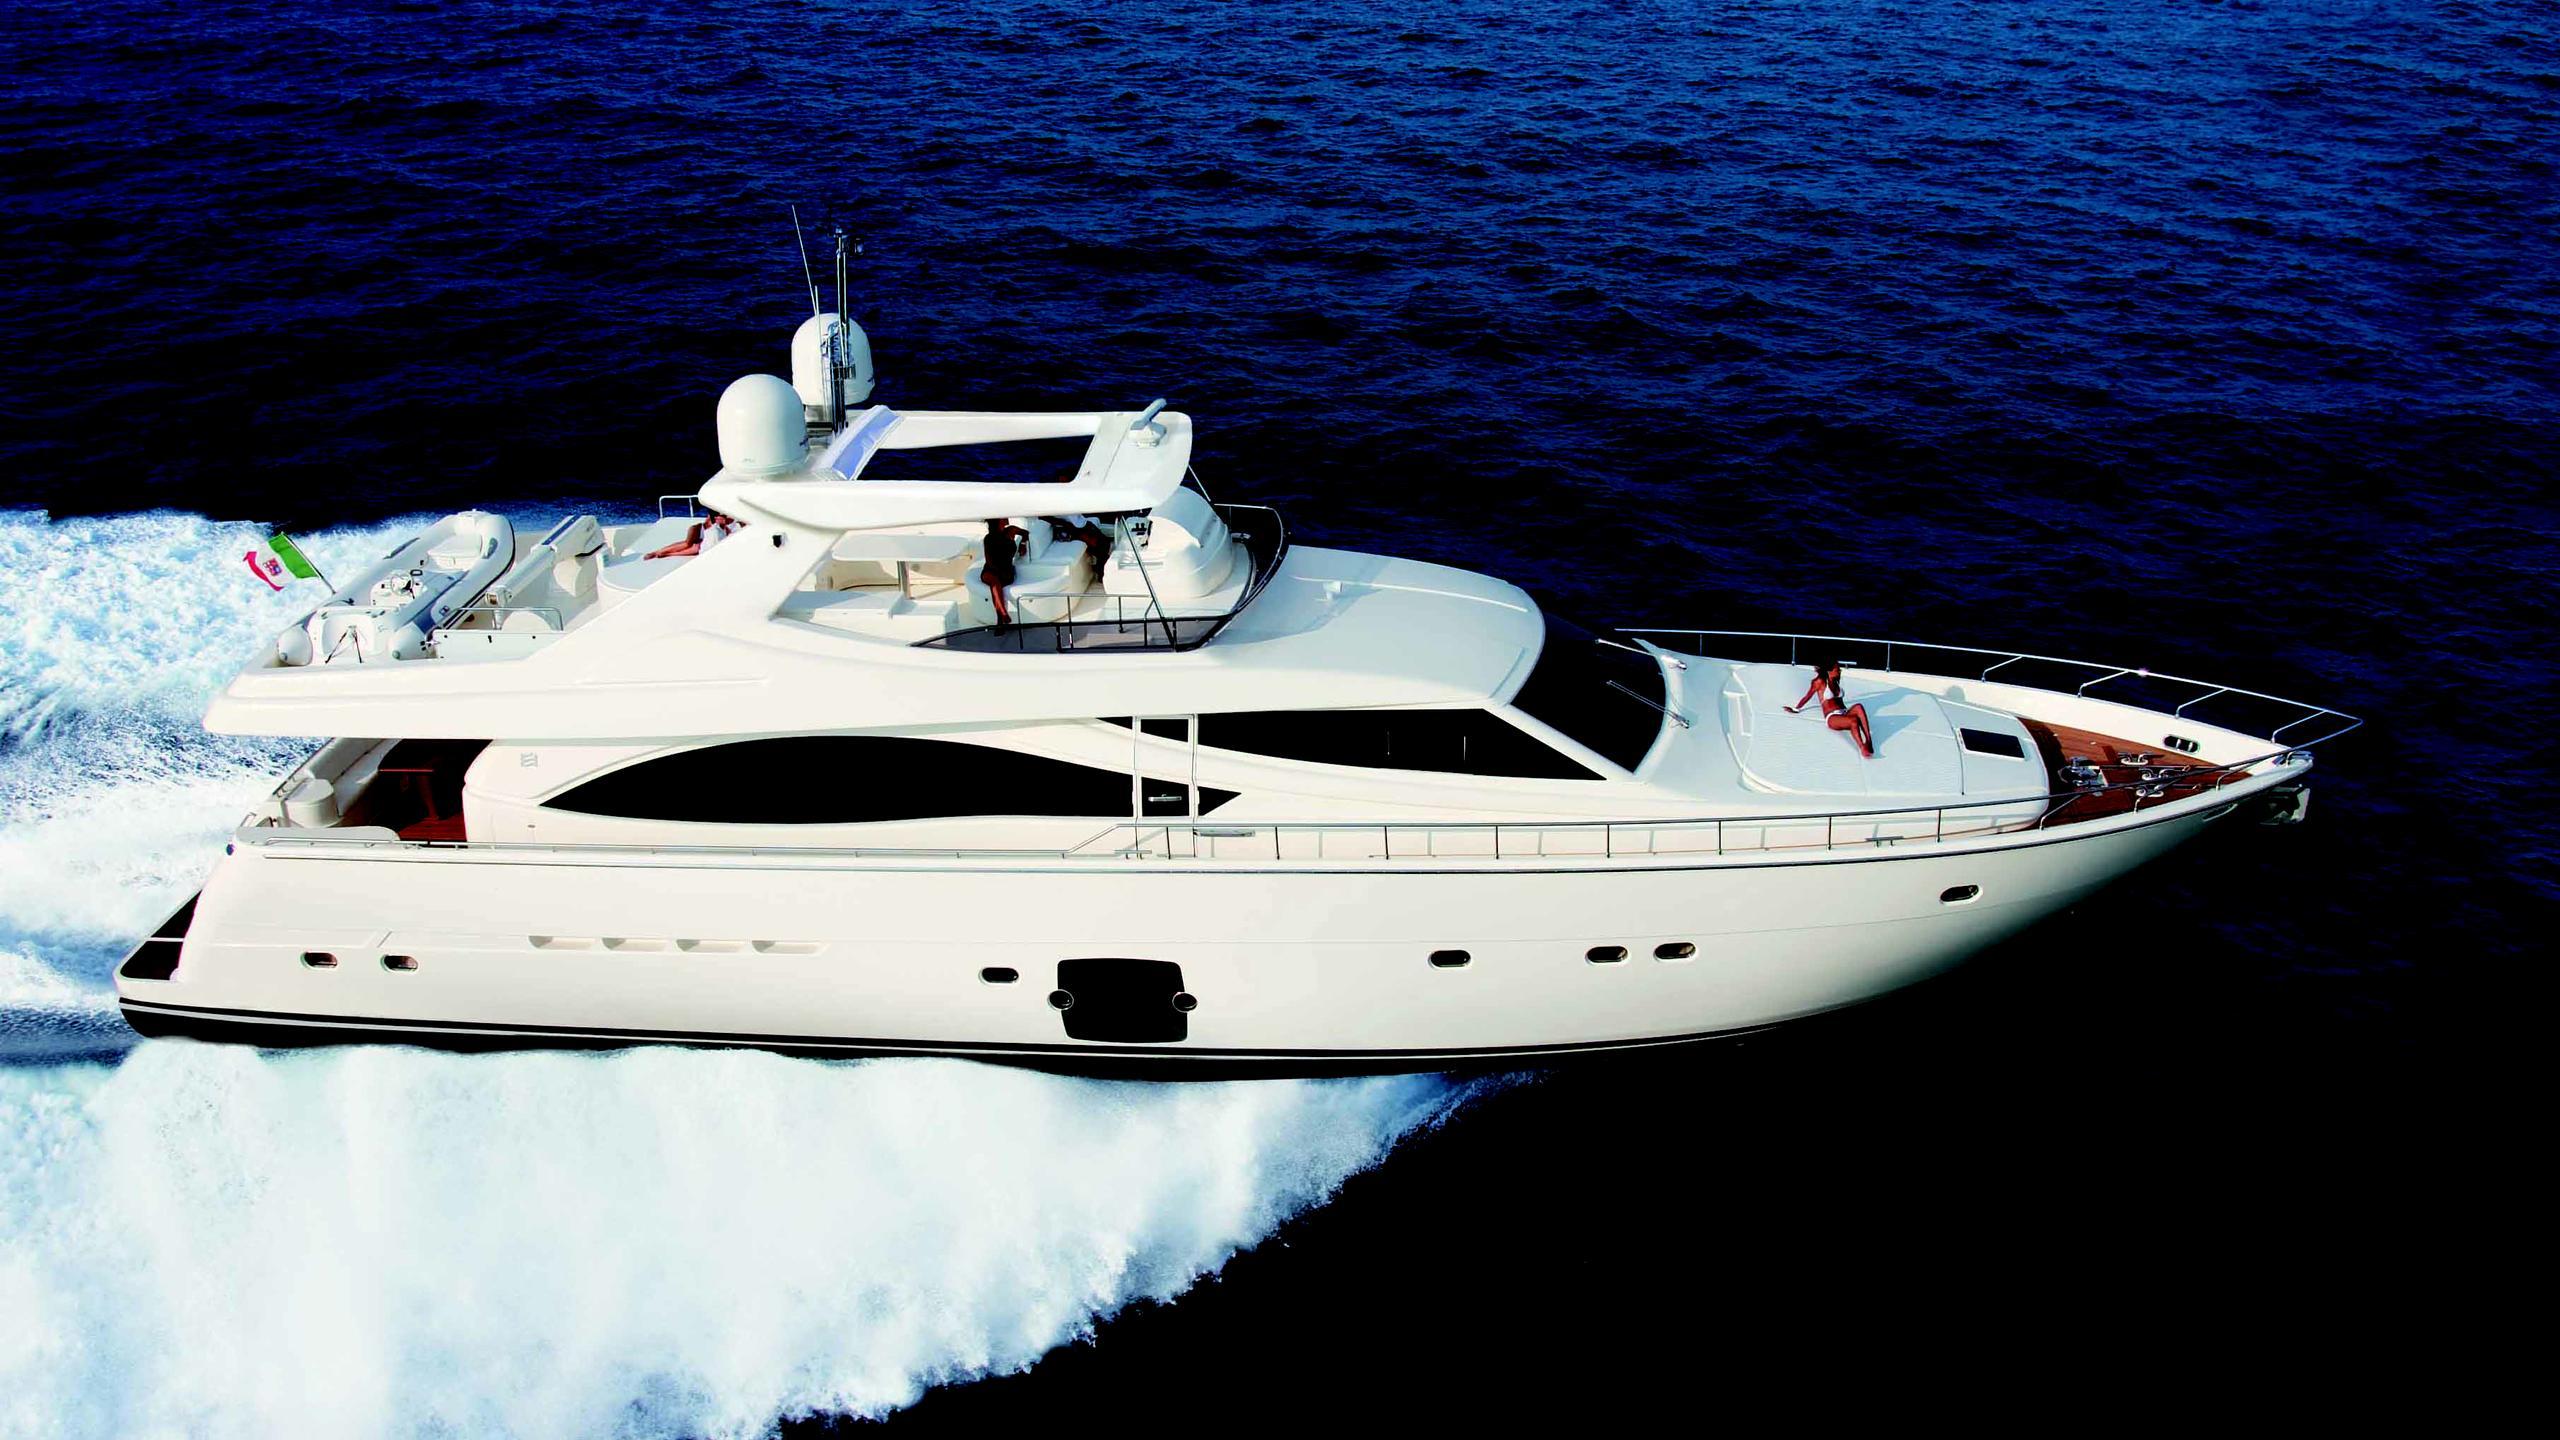 ferretti-830-01-motor-yacht-2004-25m-cruising